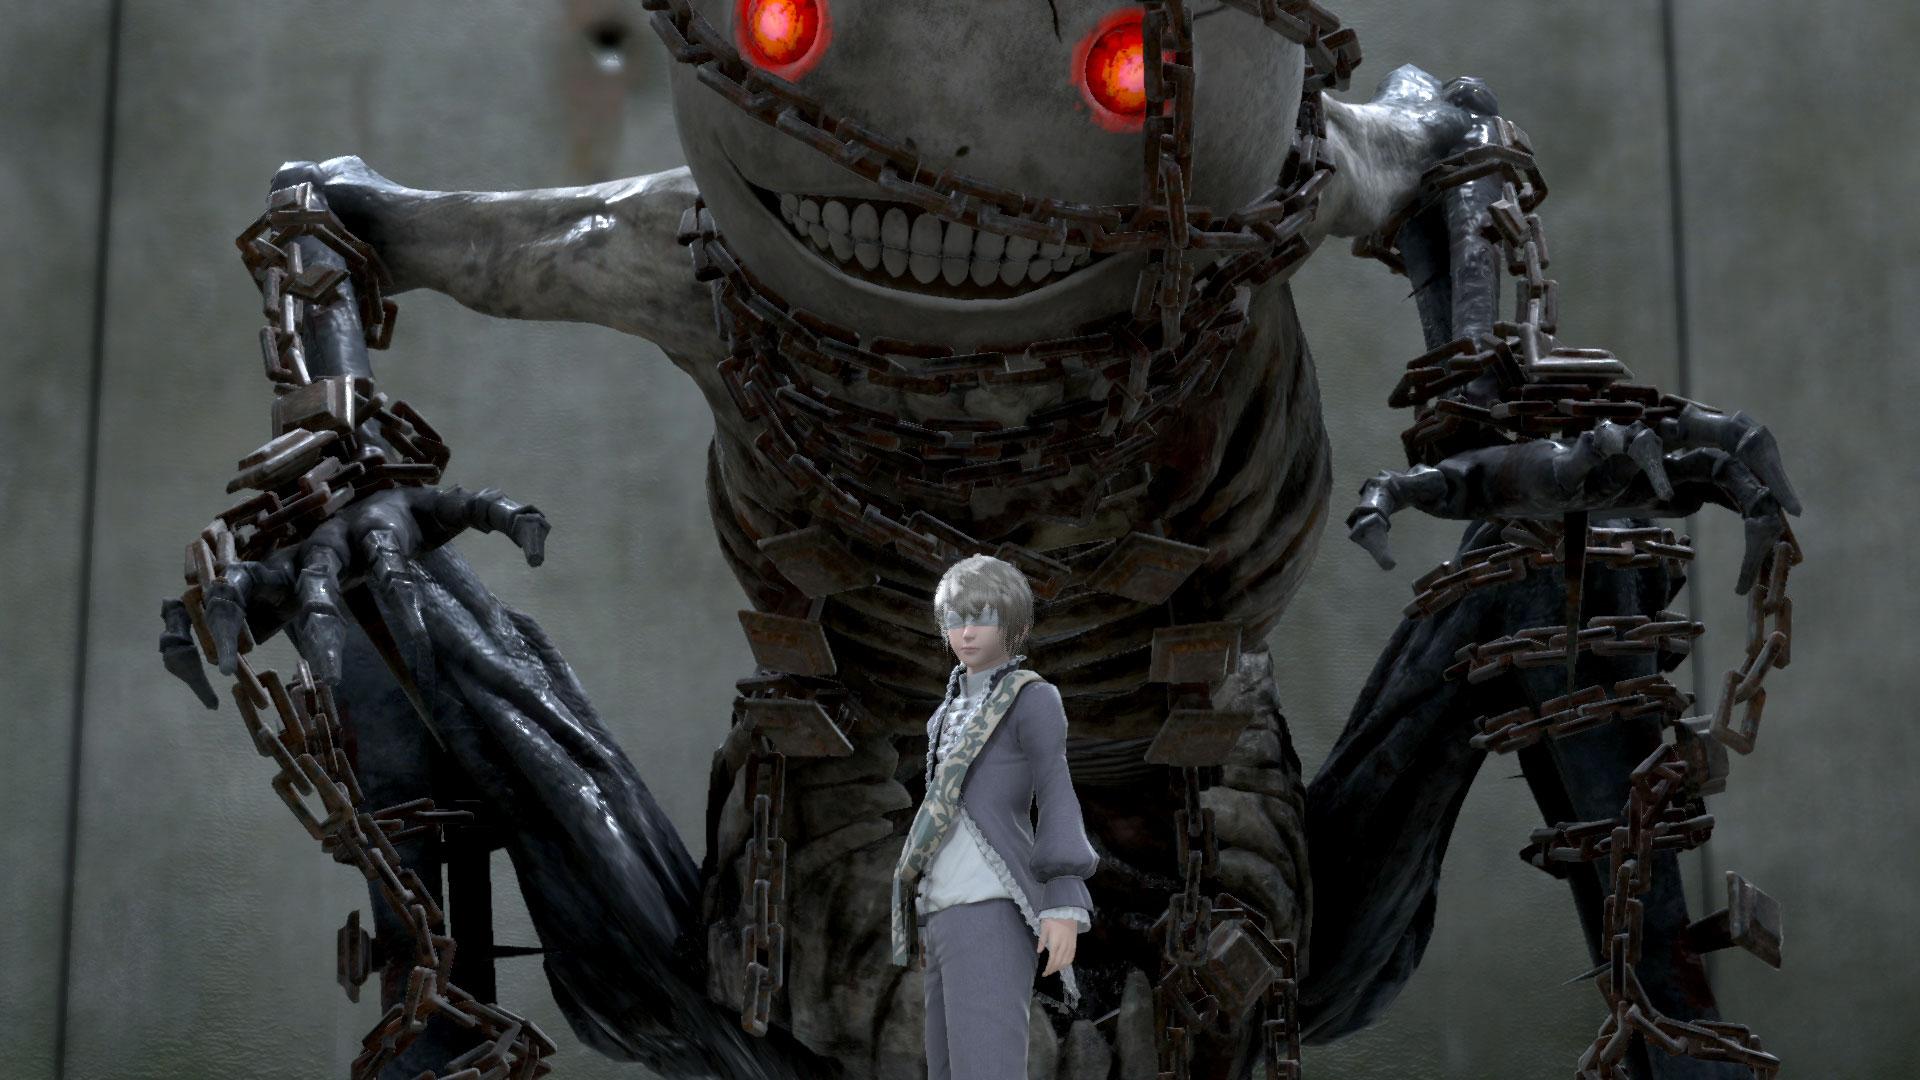 Yoko Taro Working As Creative Director on New Title With Square Enix